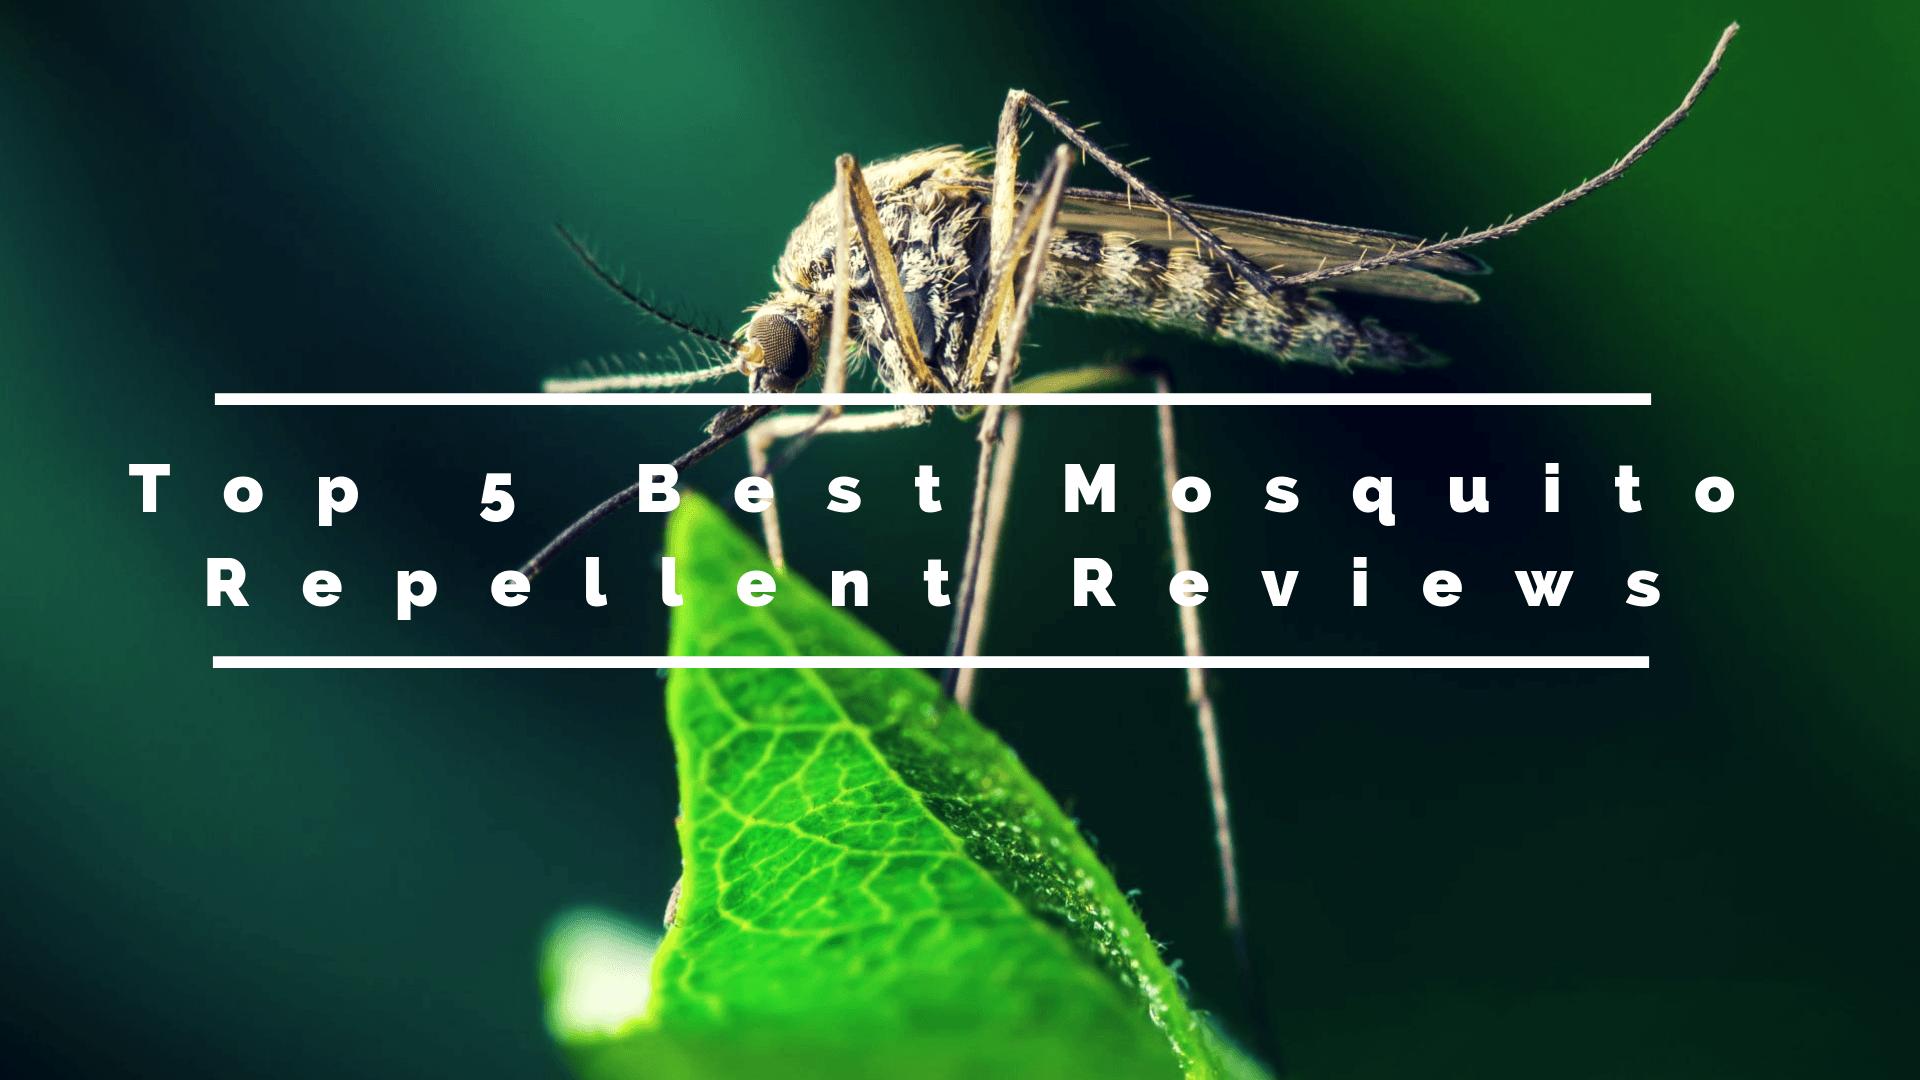 Top 5 Best Mosquito Repellent Reviews